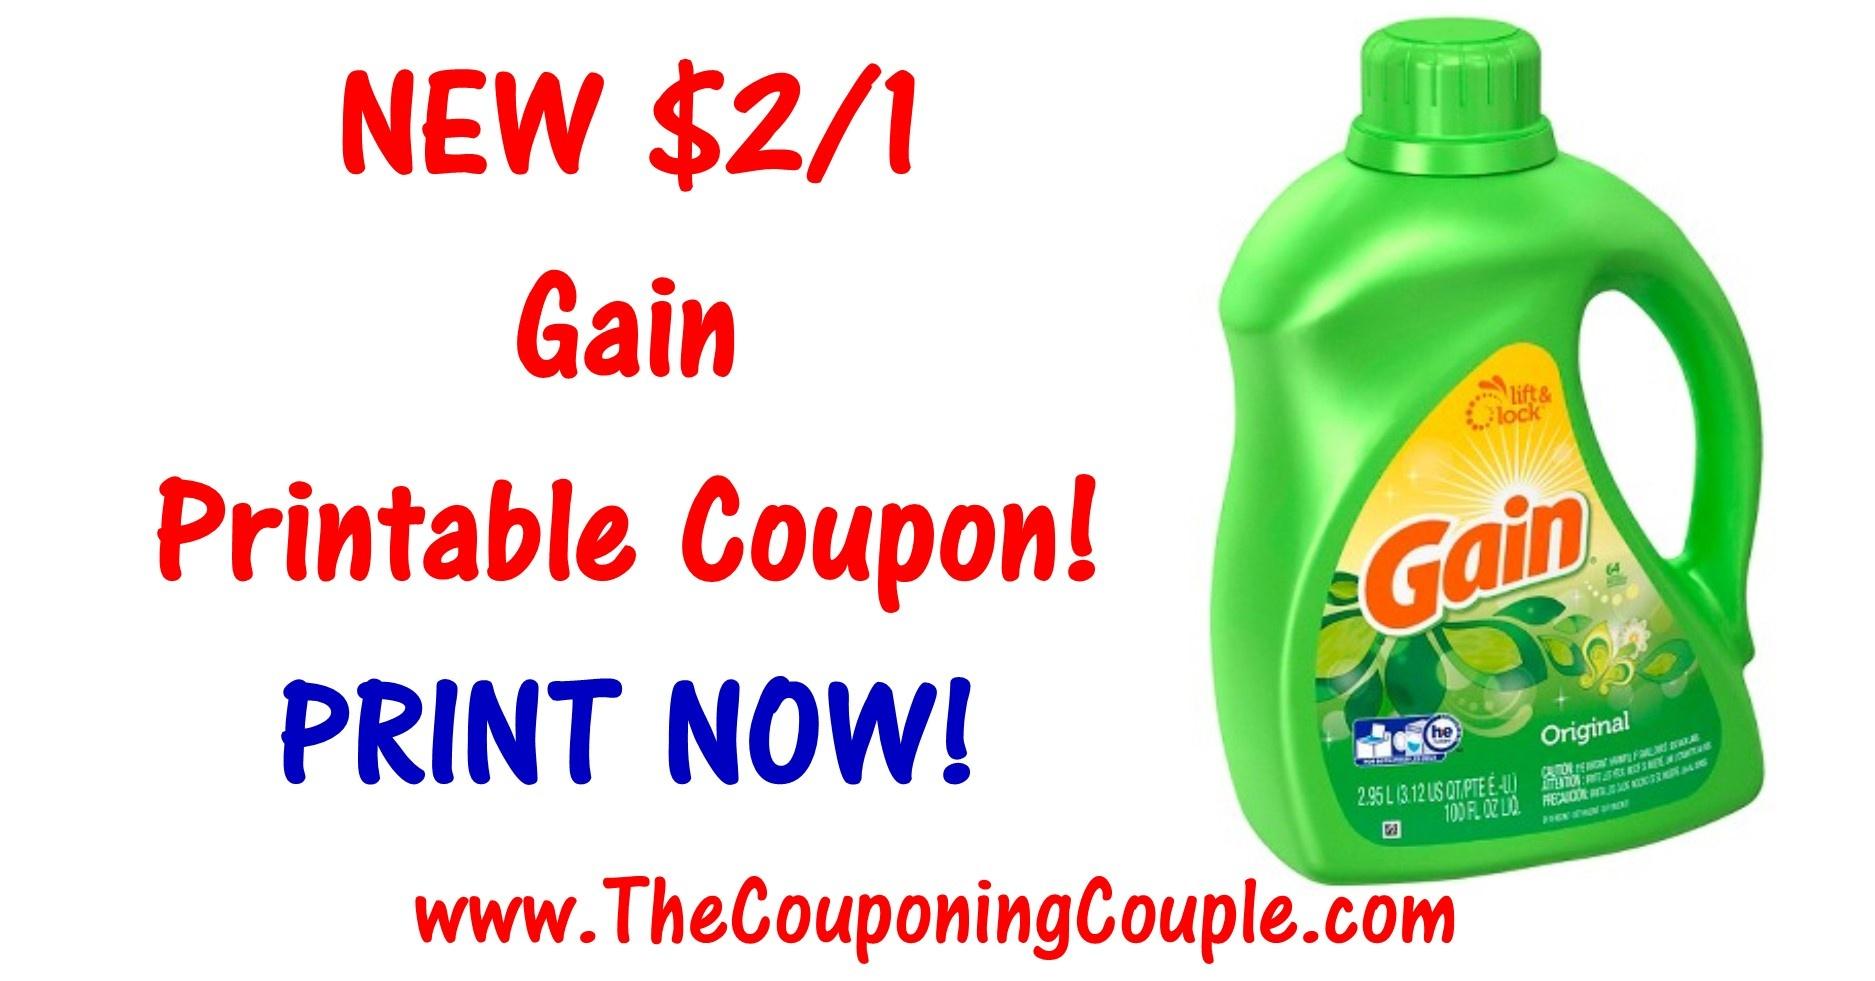 New Gain Printable Coupon ~ Print $2/1 Coupon Now! - Gain Coupons Free Printable